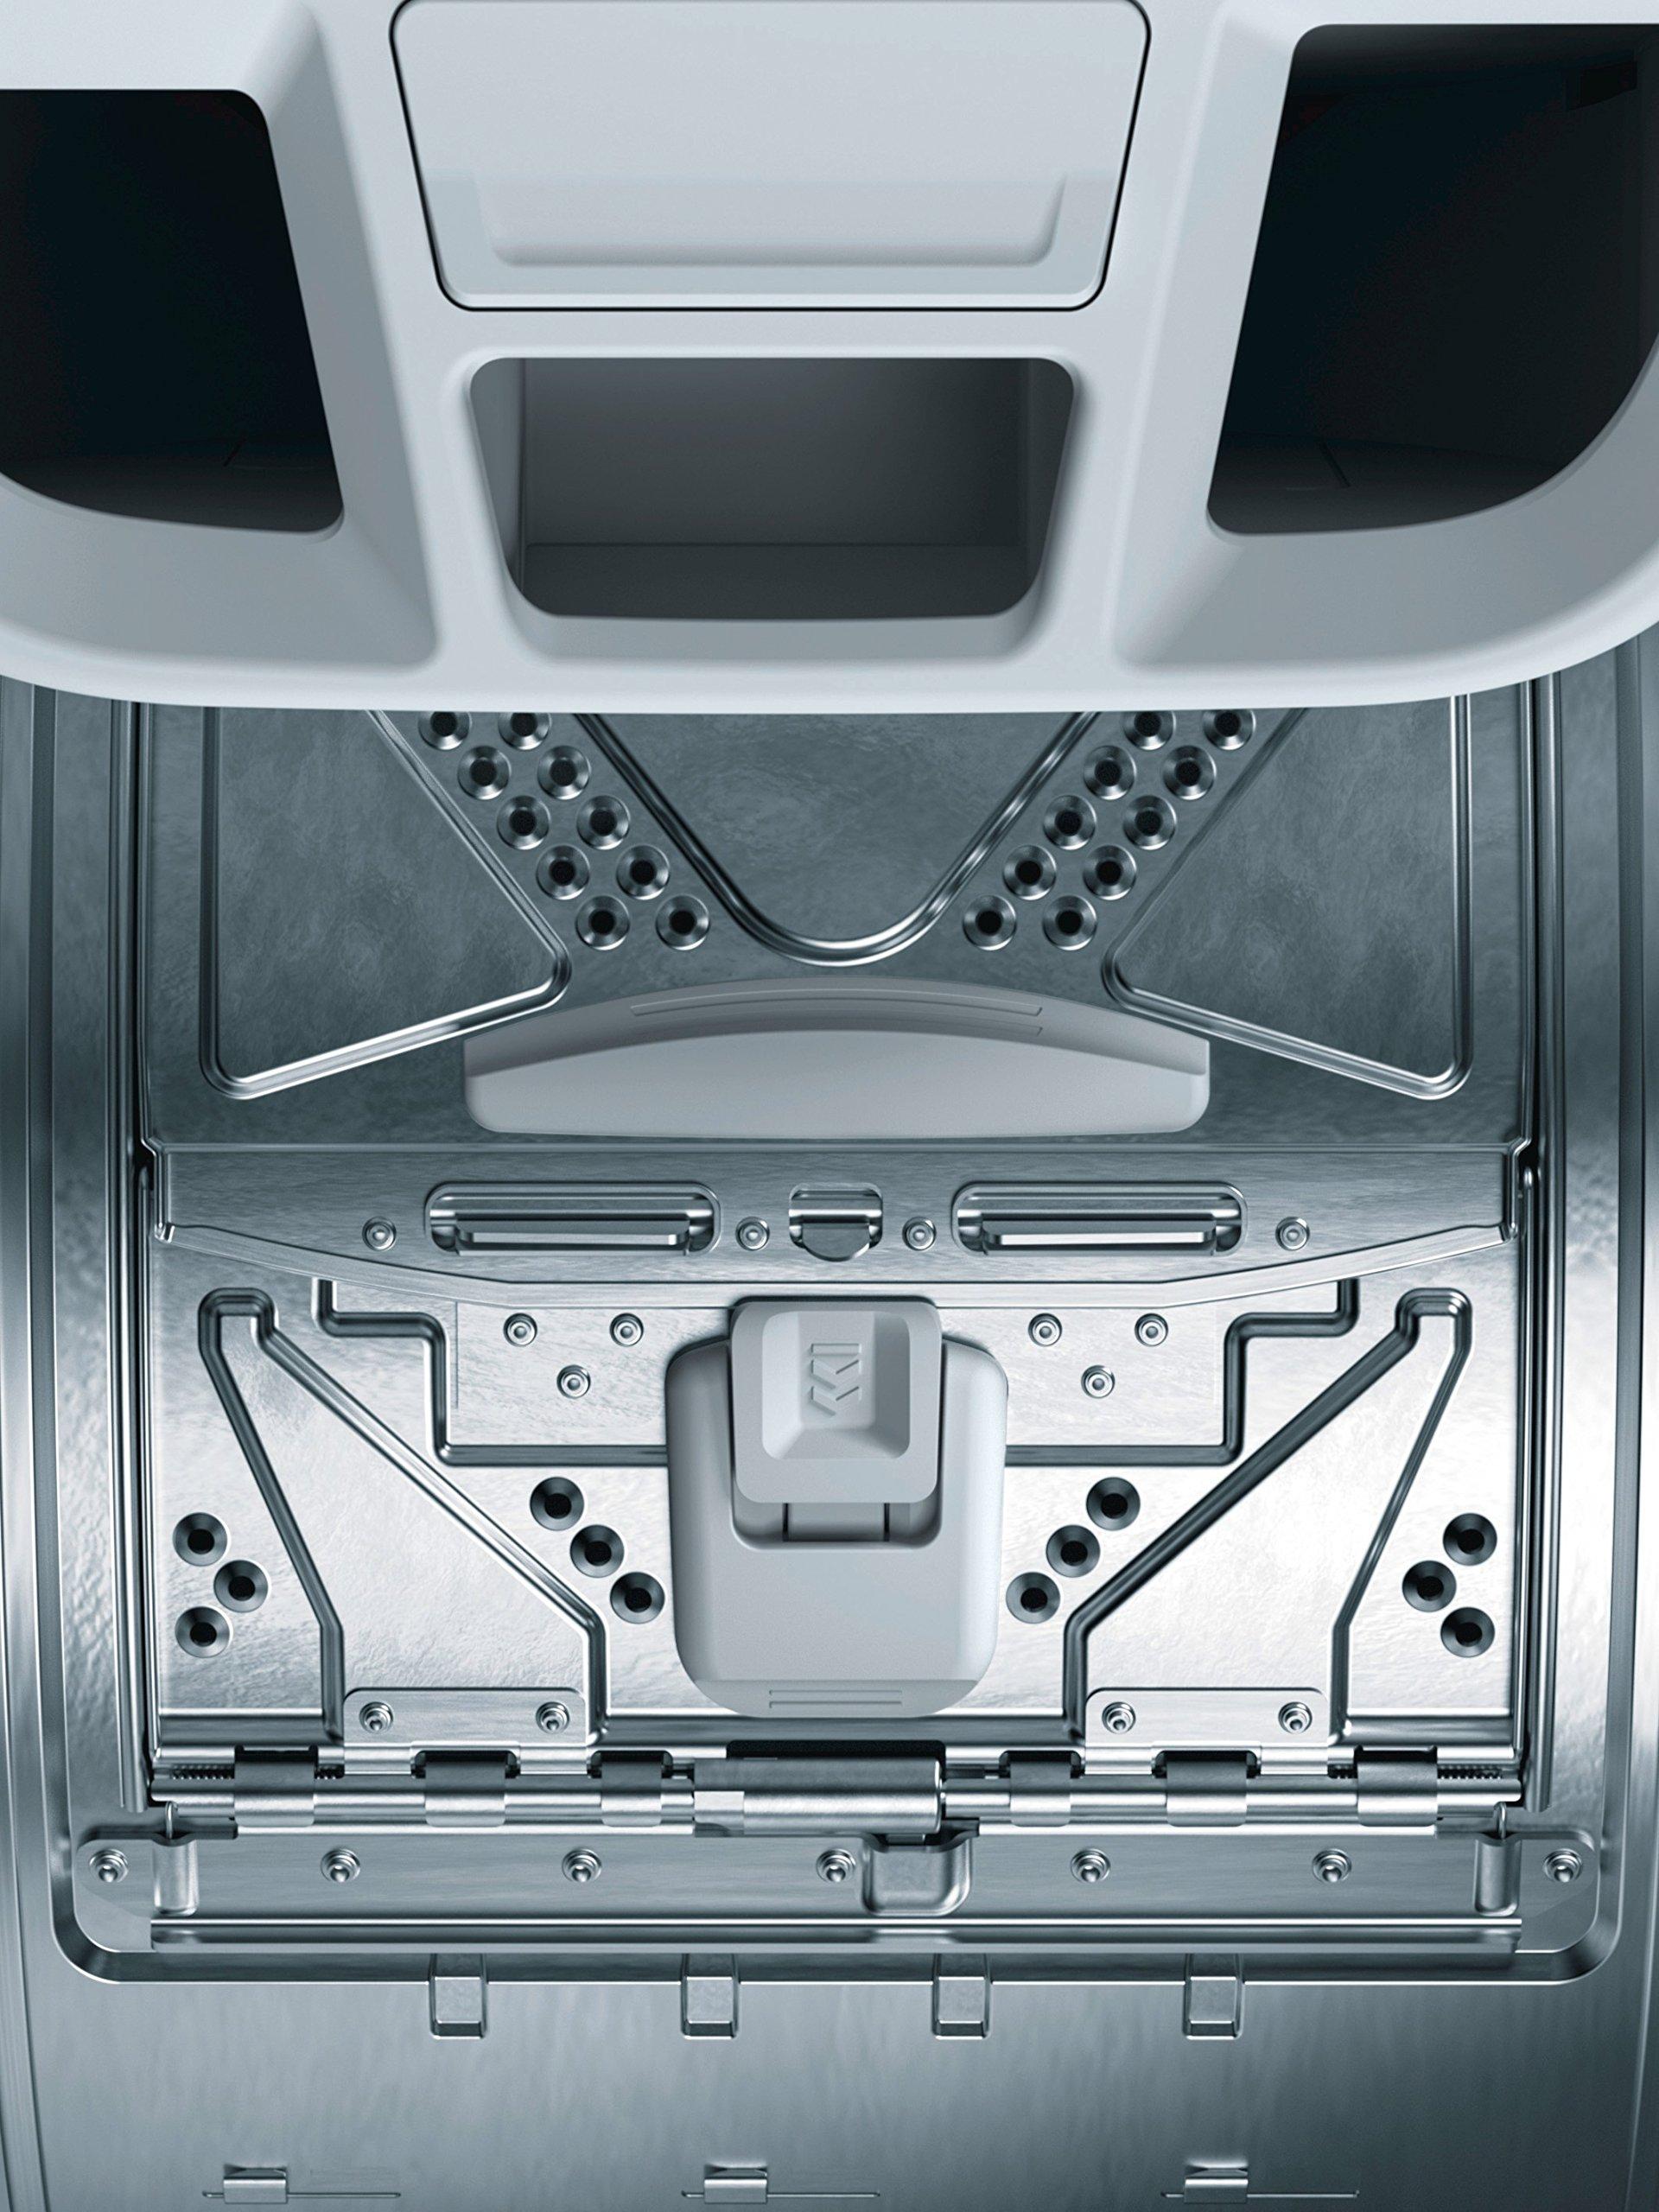 Siemens-wp12r156ff-autonome-Ladekabel-Premium-65-kg-1200trmin-A-Wei-Waschmaschine–Waschmaschinen-Ladekabel-autonome-Premium-wei-oben-Wei-42-l